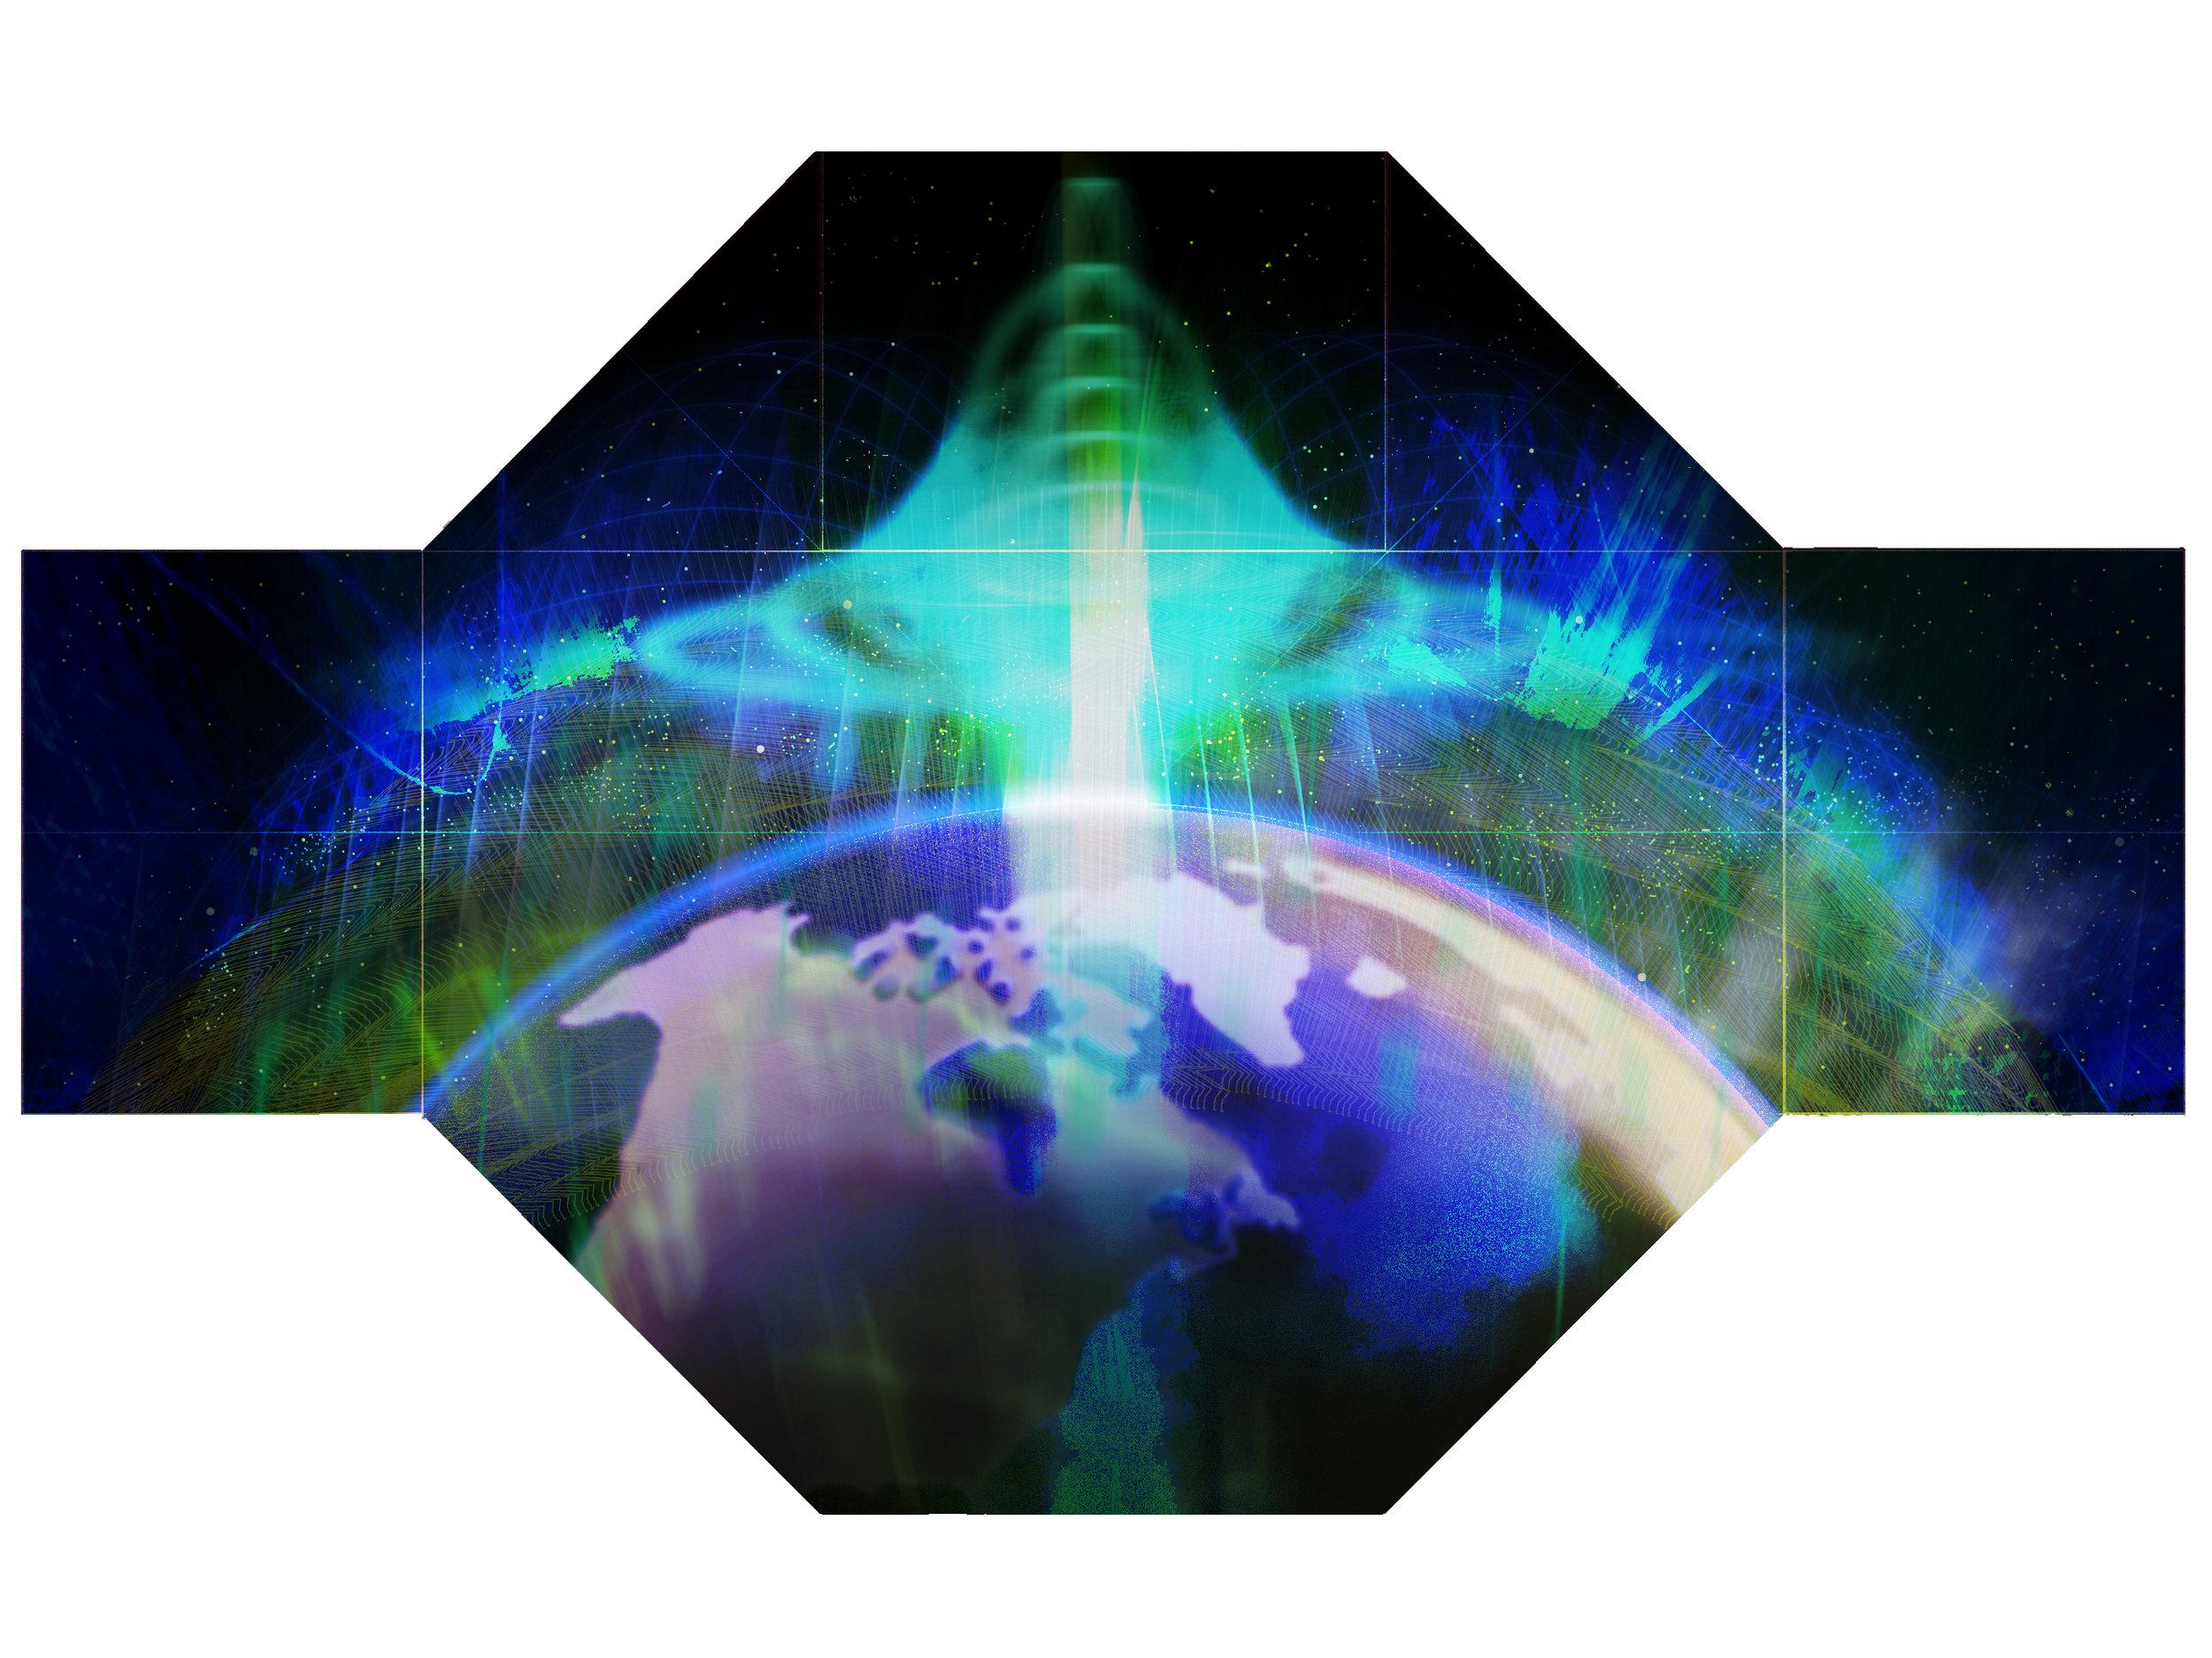 CaseStudySpheres_17.jpg